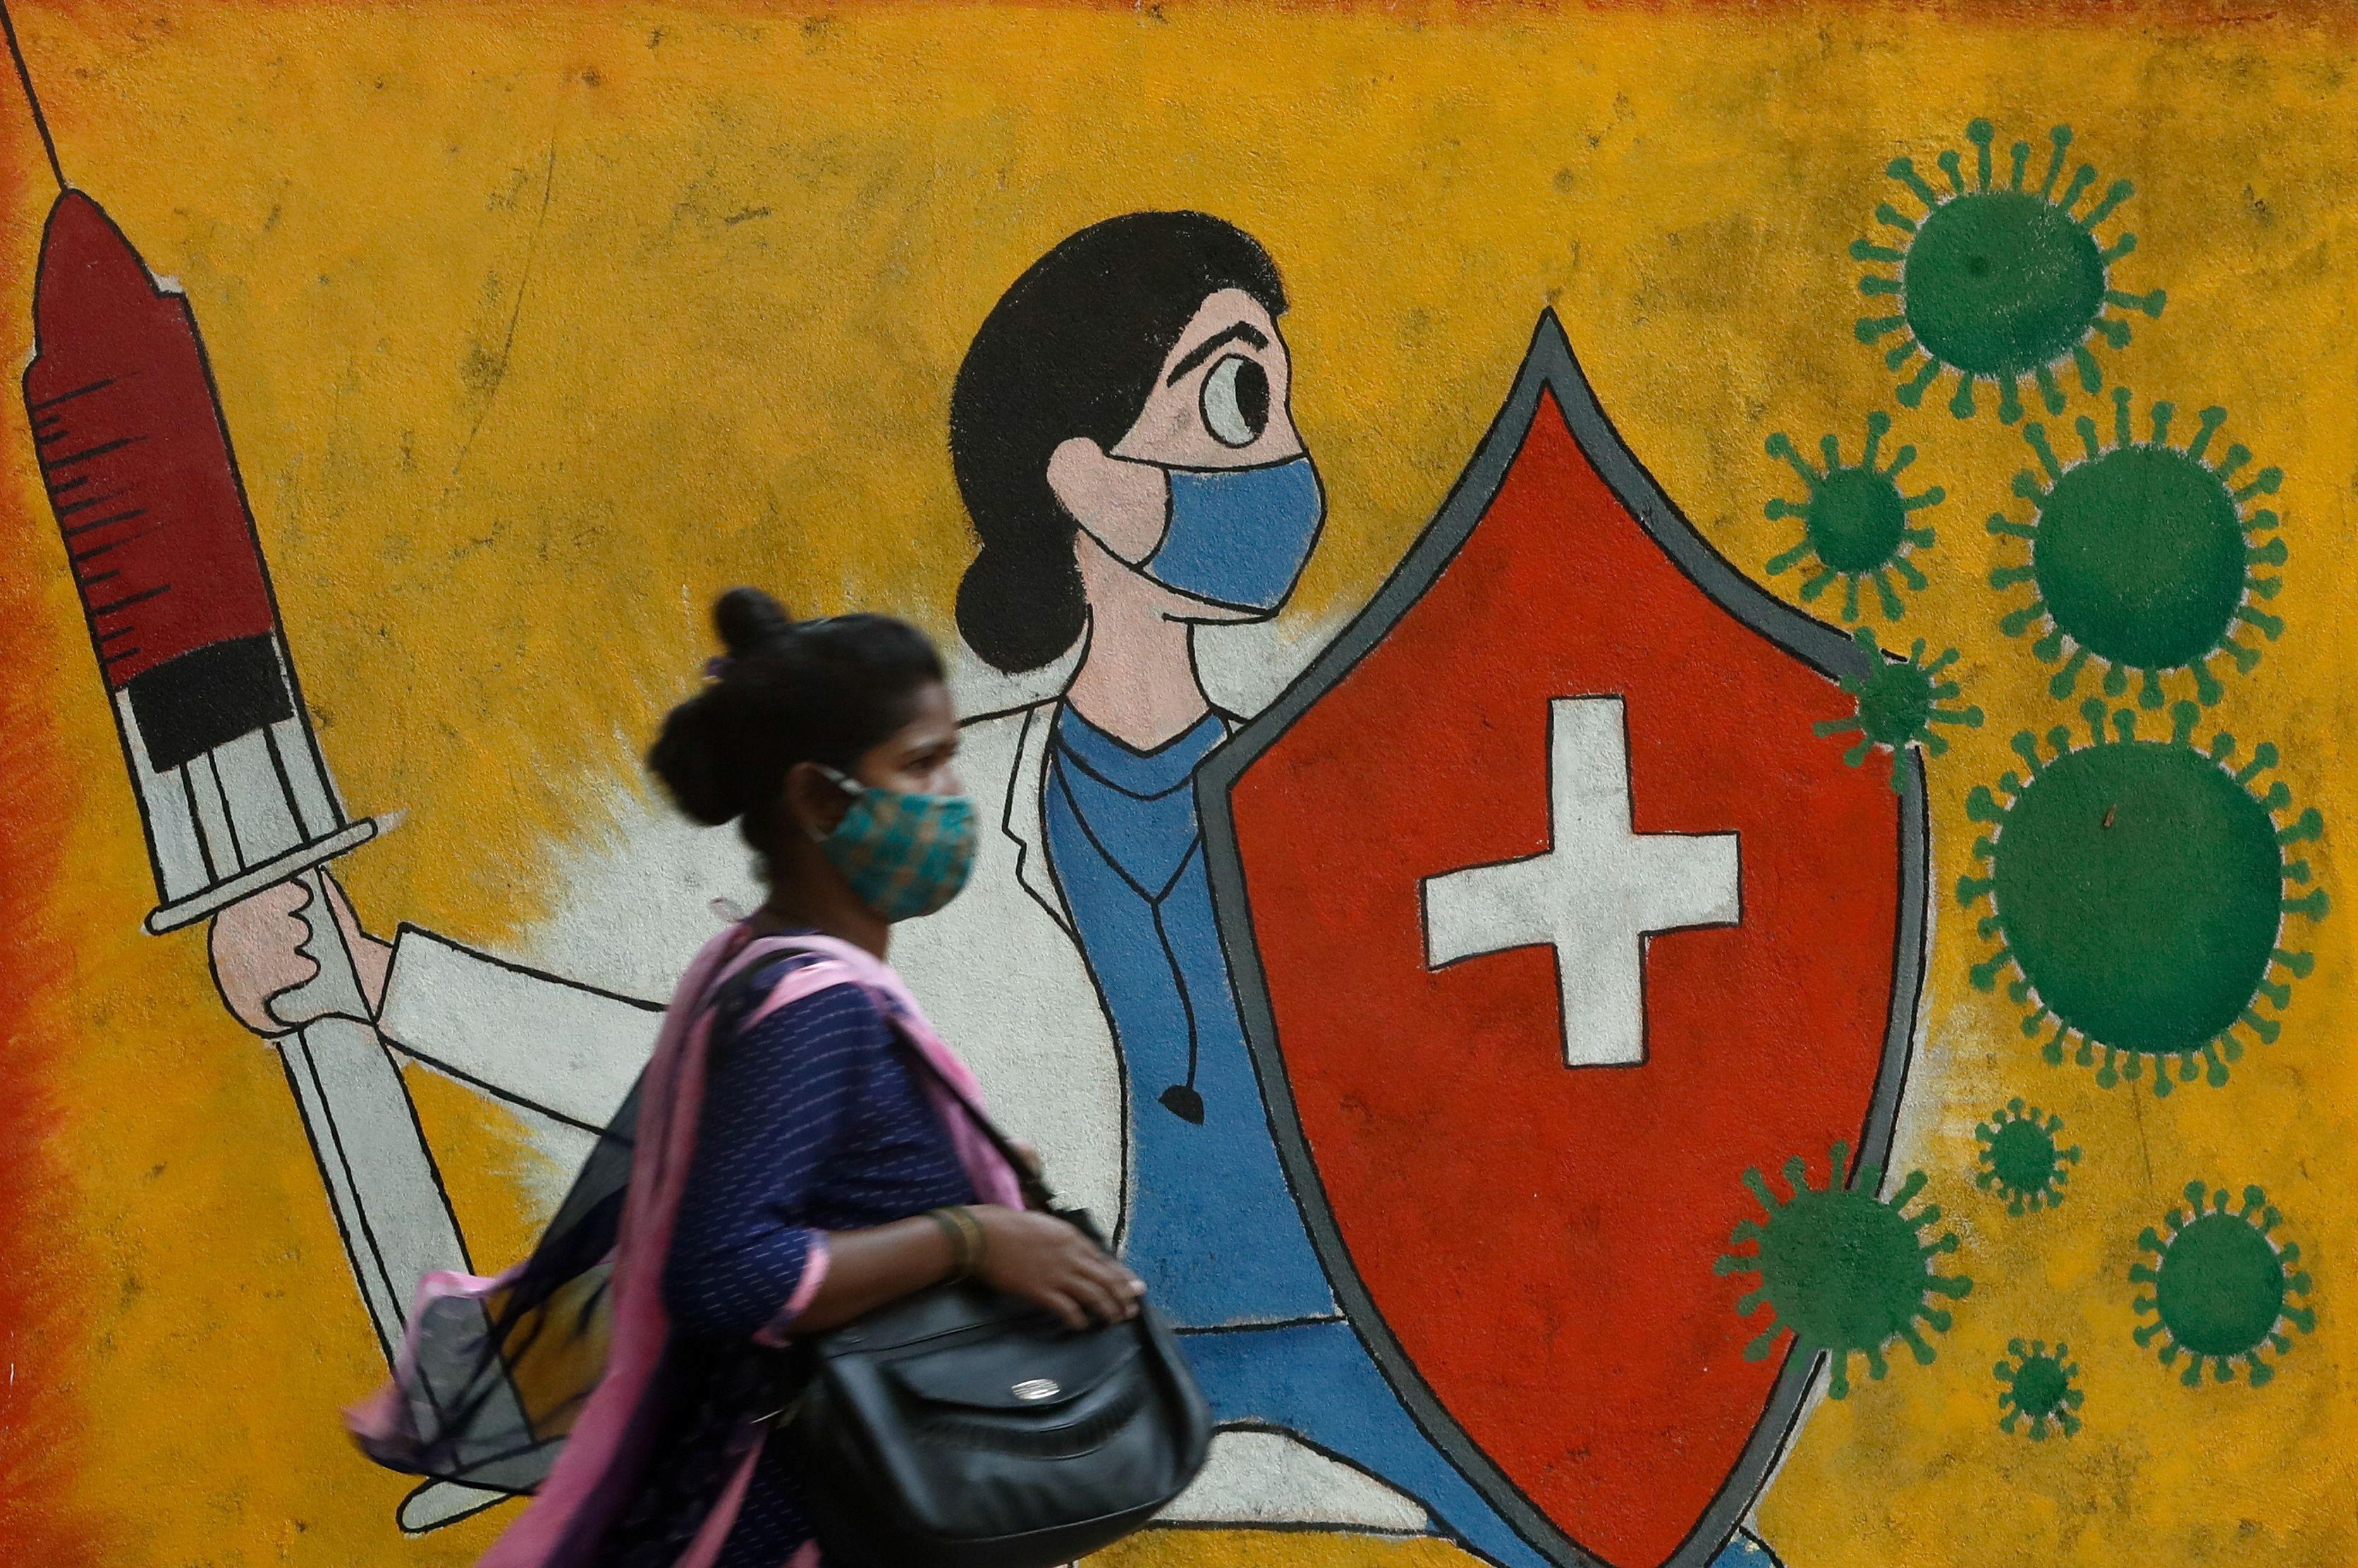 A woman walks past a graffiti on a street, amidst the spread of the coronavirus disease (COVID-19) in Mumbai, India, May 10, 2021. REUTERS/Francis Mascarenhas